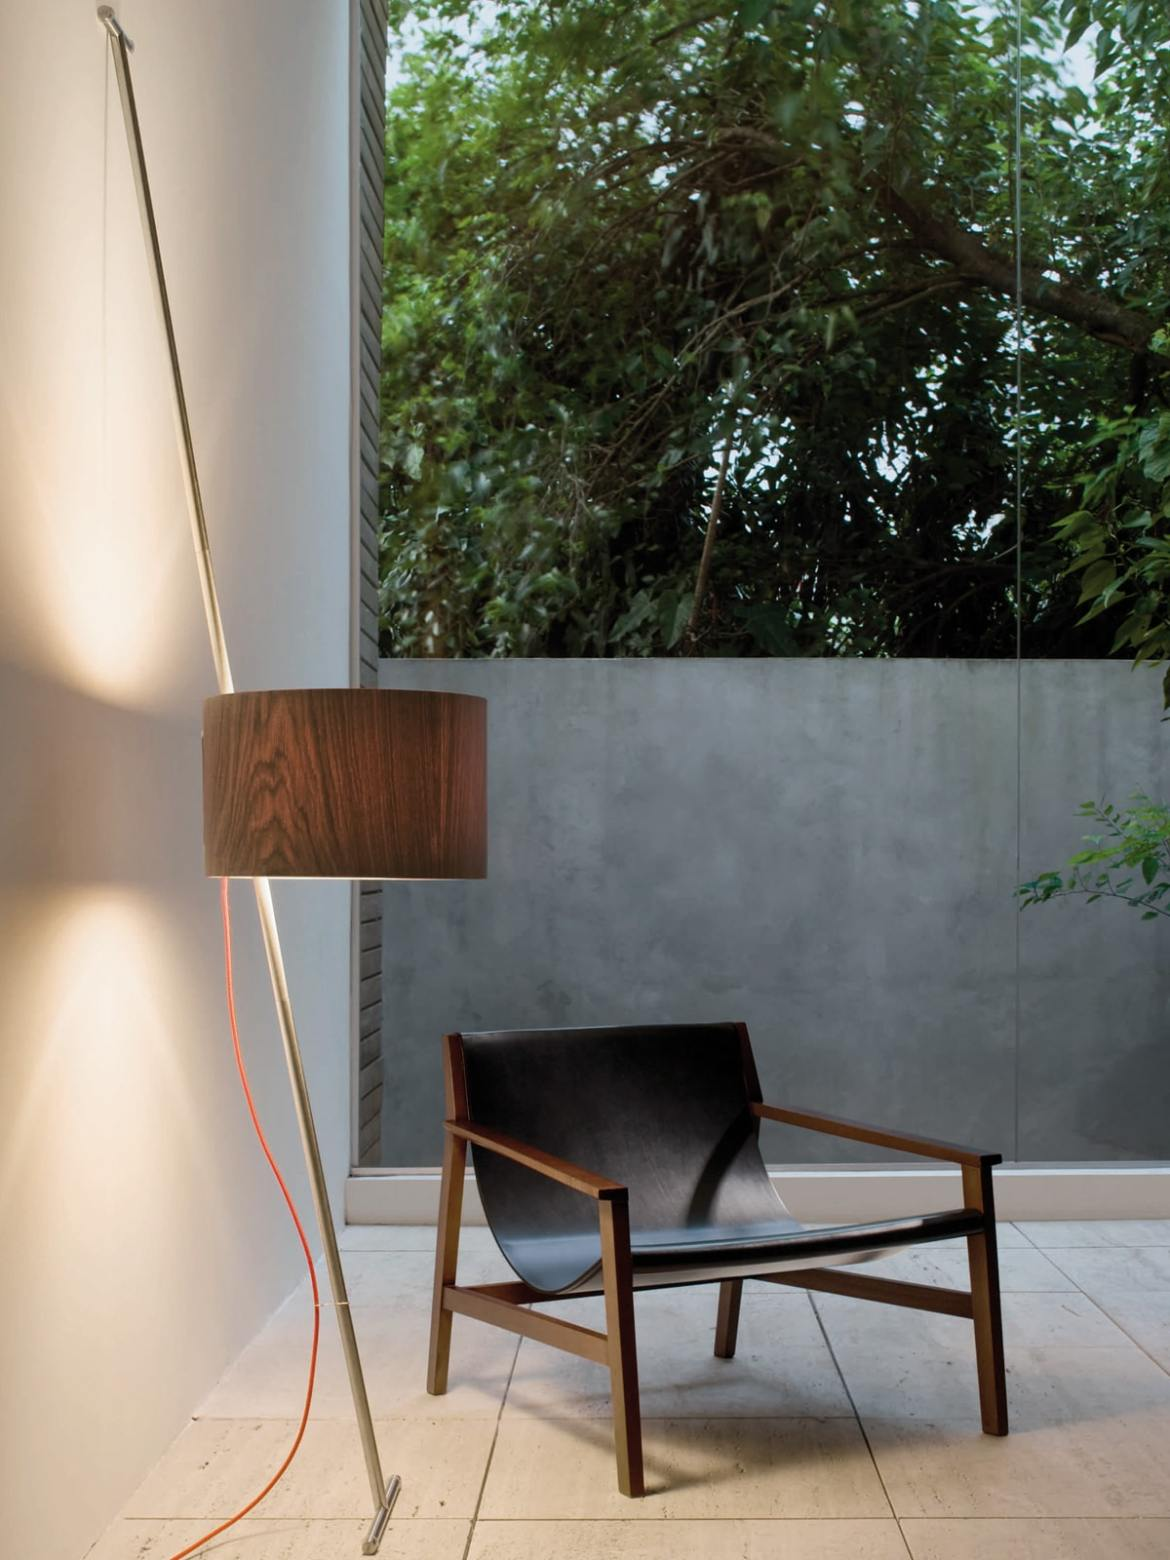 DesignOrt Blog: Lampen Trends 2019 Lumini Lift Stehleuchte Lampe